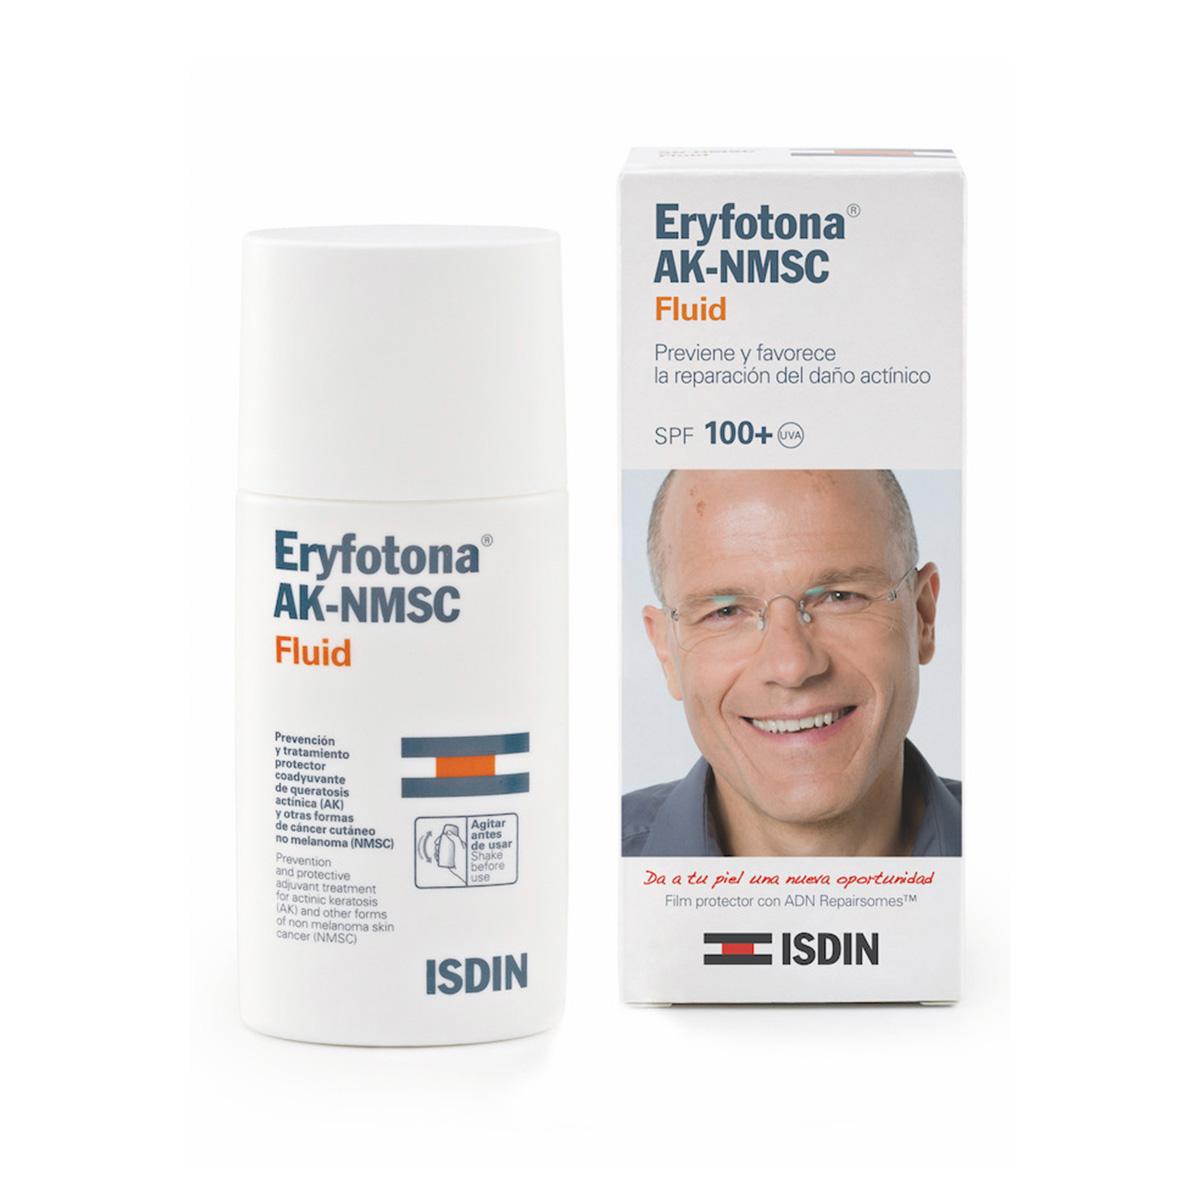 ERYFOTONA AK-NMSC FLUID 50ML - Vider Salud Dermatológica